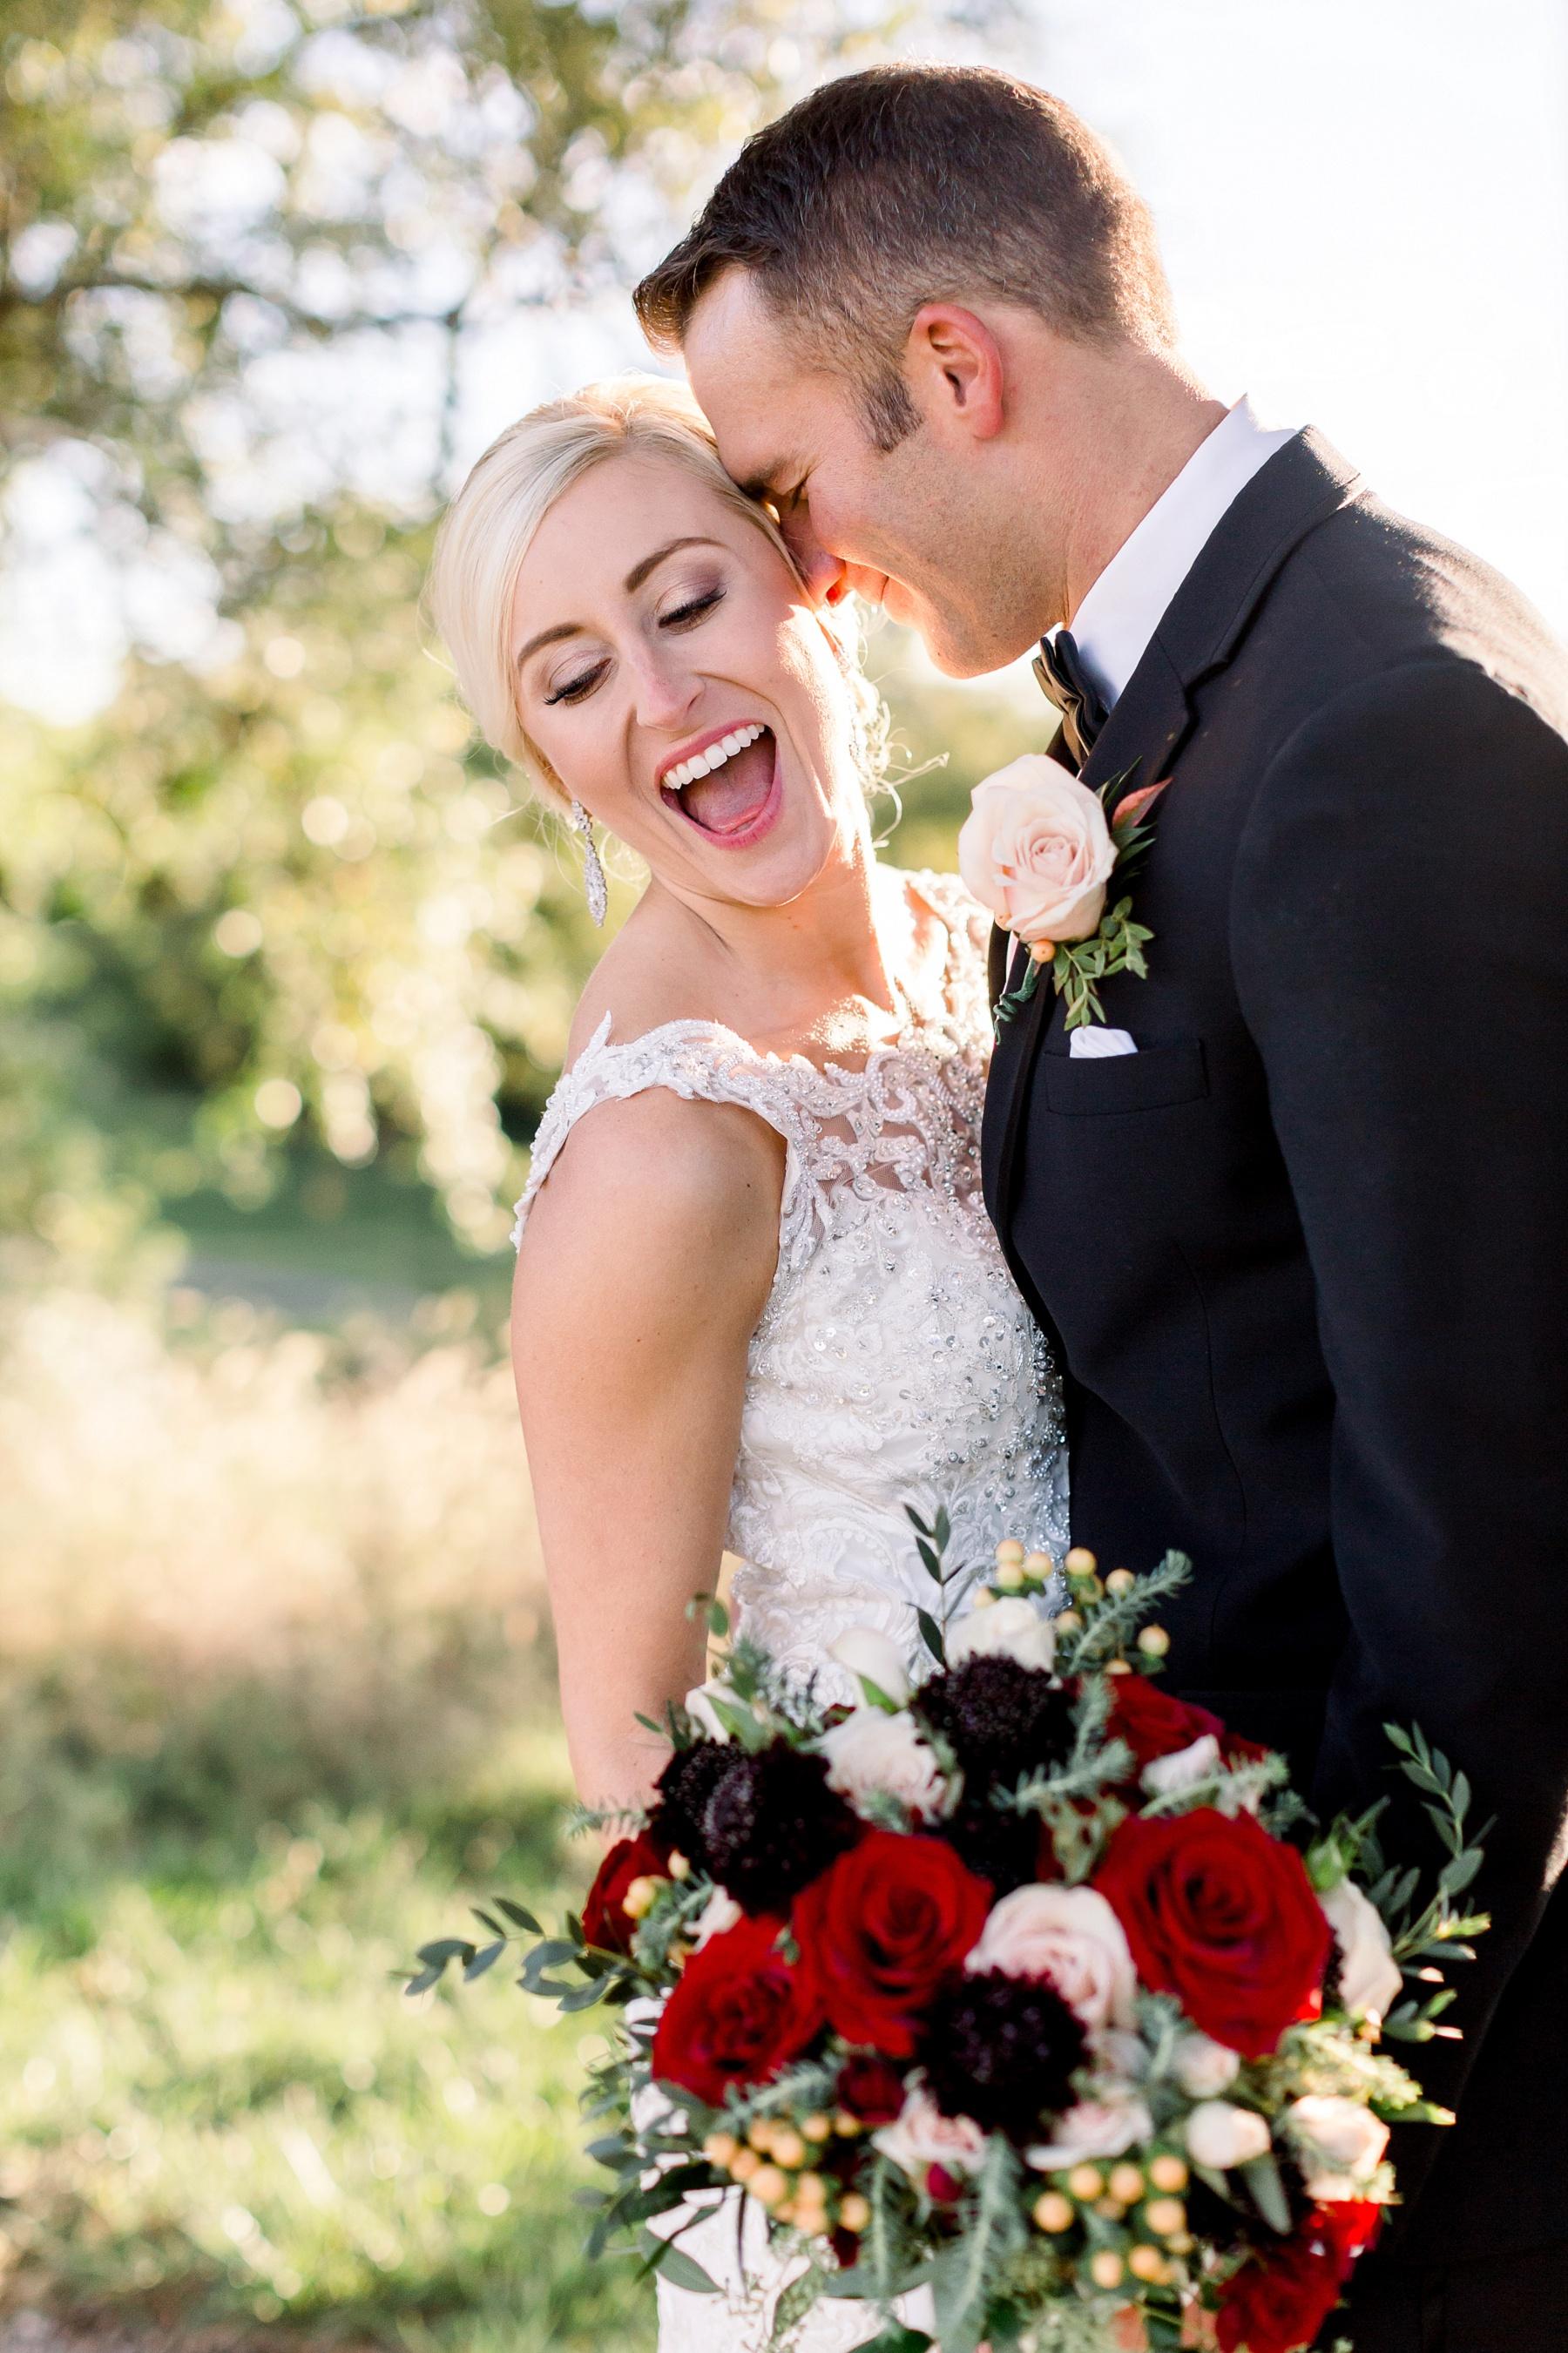 midwest-adventurous-wedding-photographer-elizabeth-ladean-photography-photo_4808.jpg